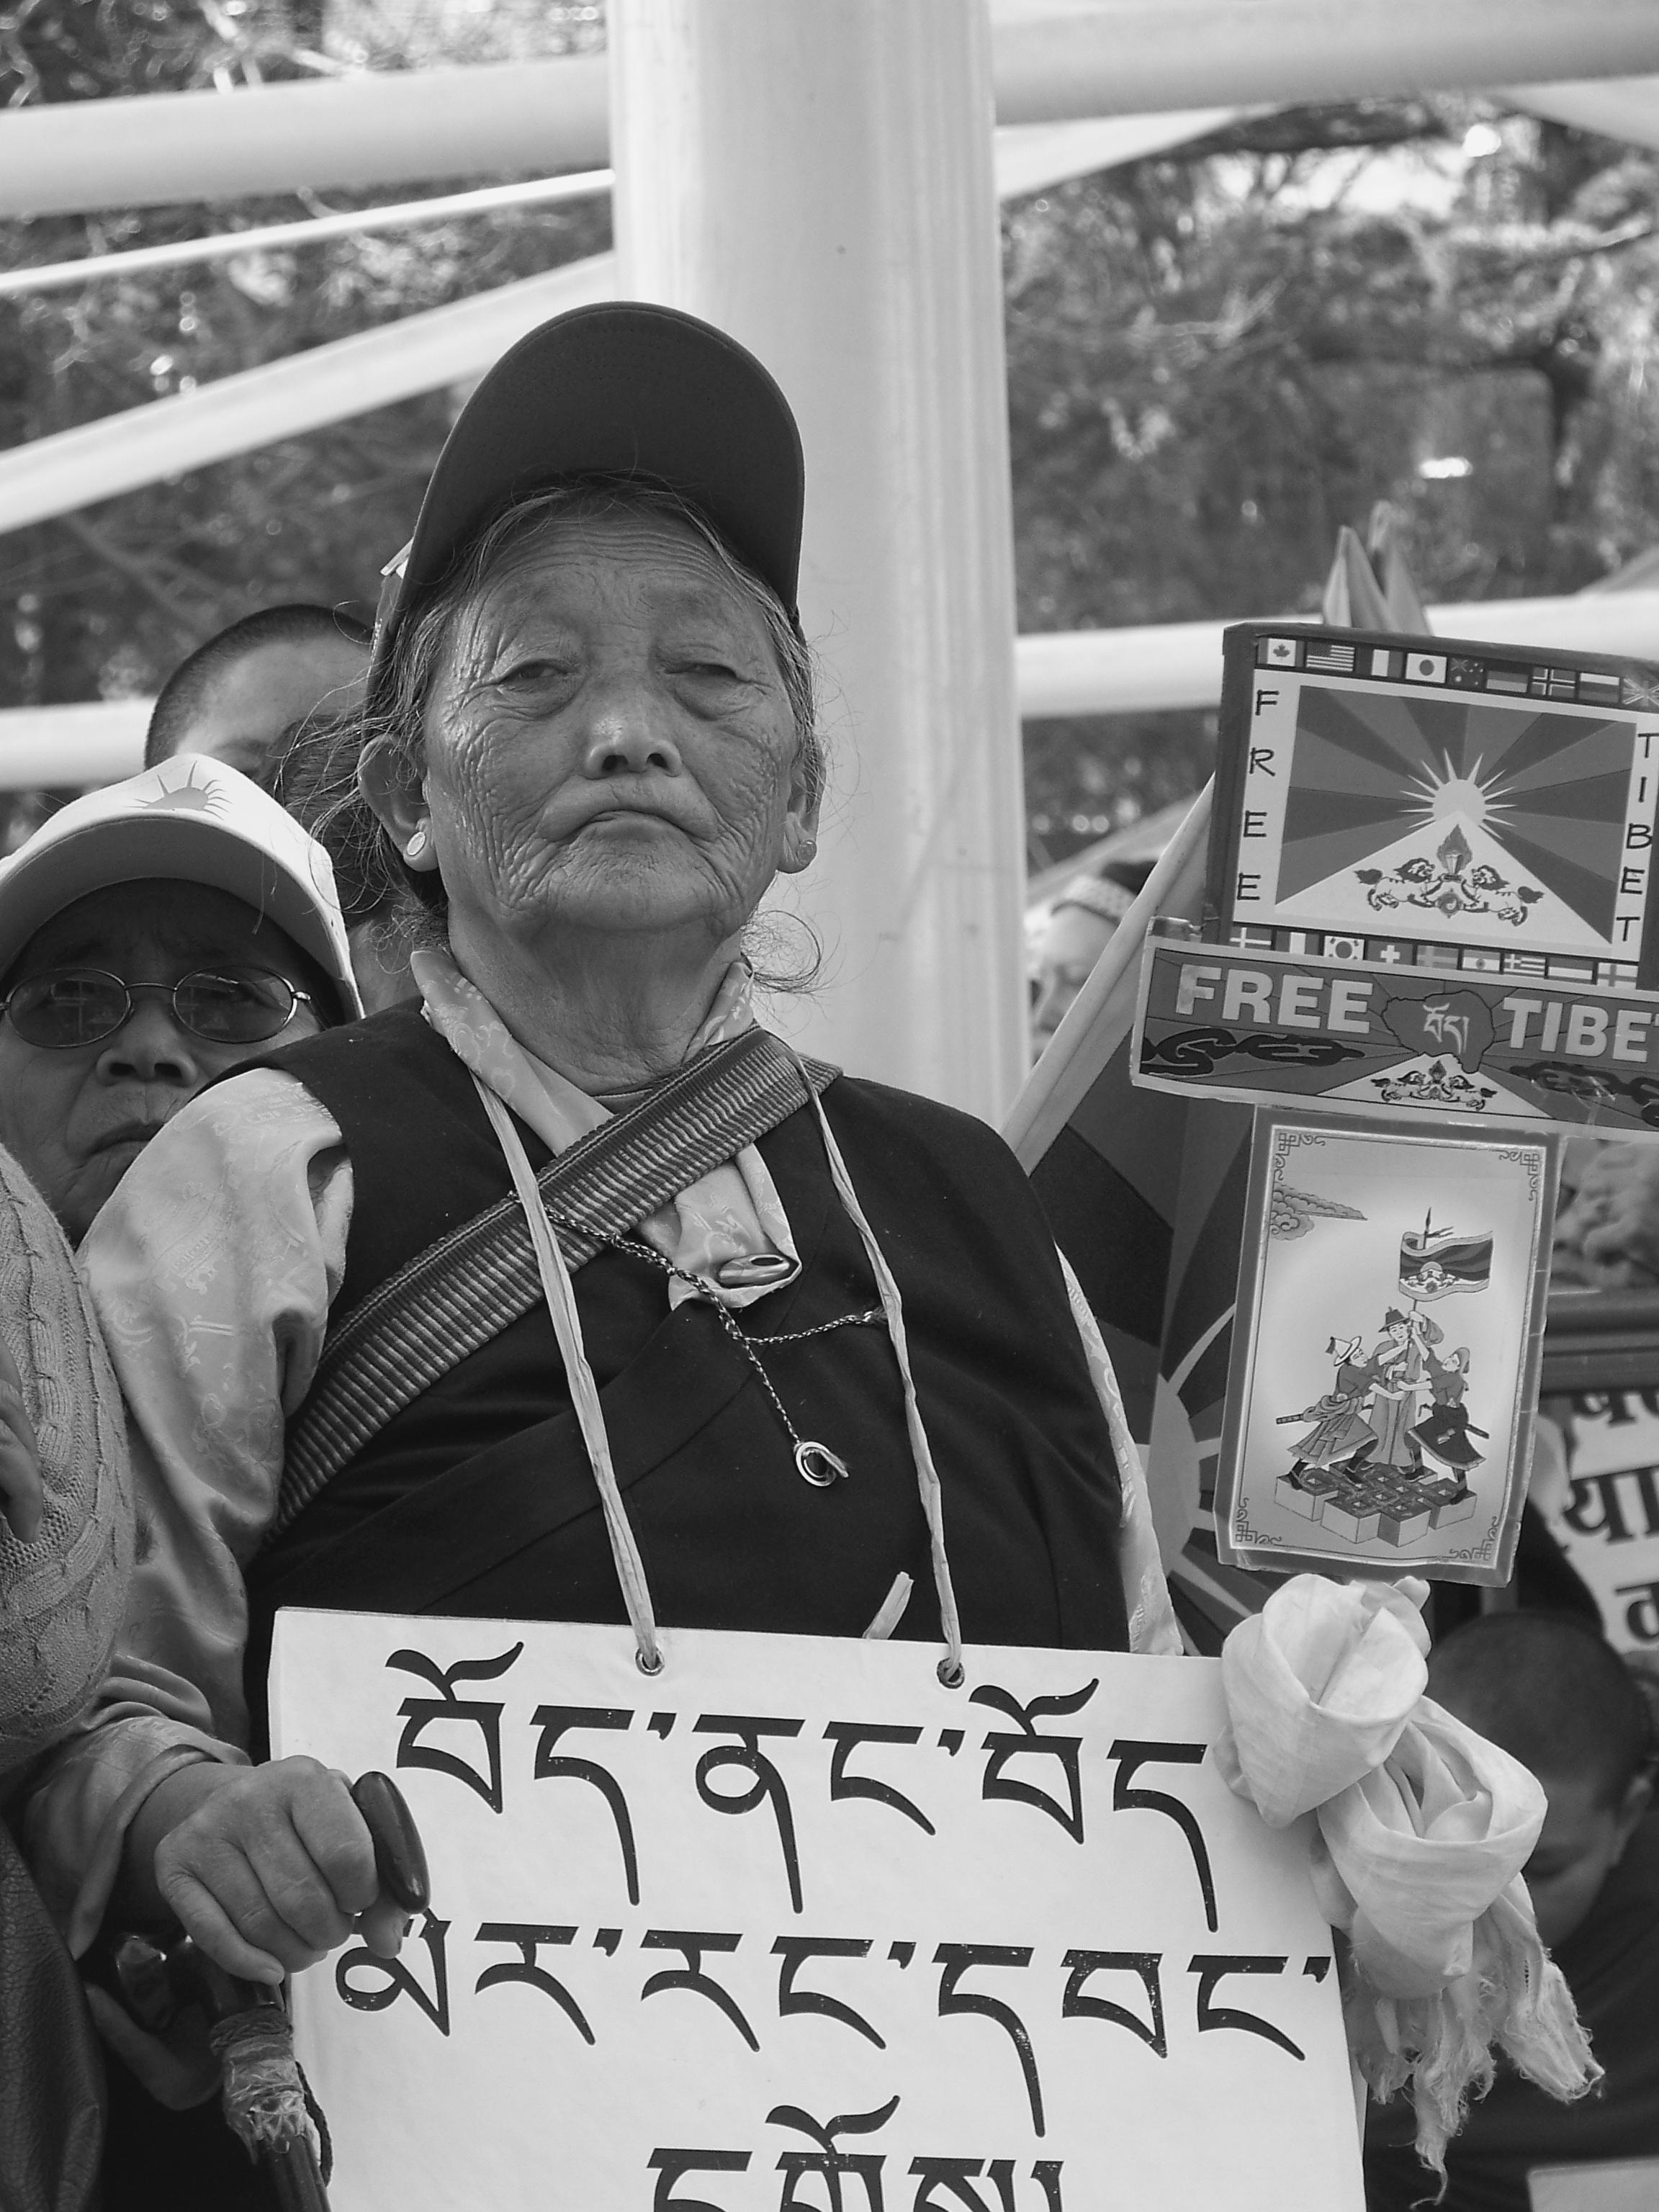 201_1783 Jonathan Machler, Tibétains à Dharamsala, Copyright